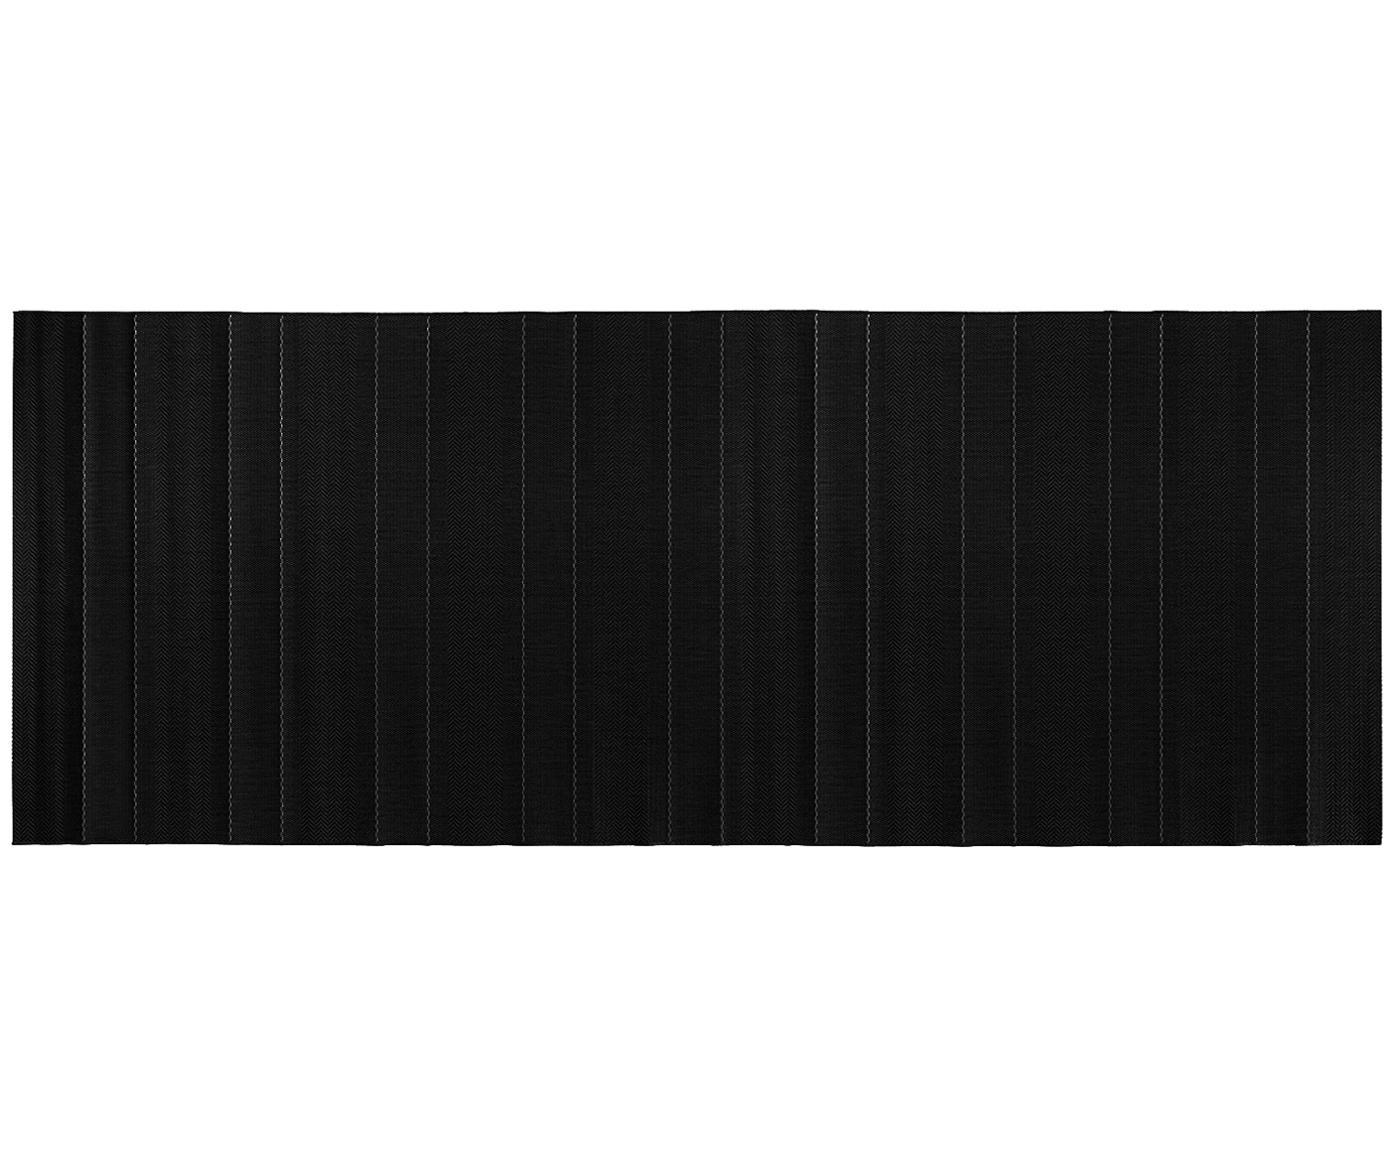 Passatoia da interno-esterno Sunshine, Nero, crema, Larg. 80 x Lung. 200 cm